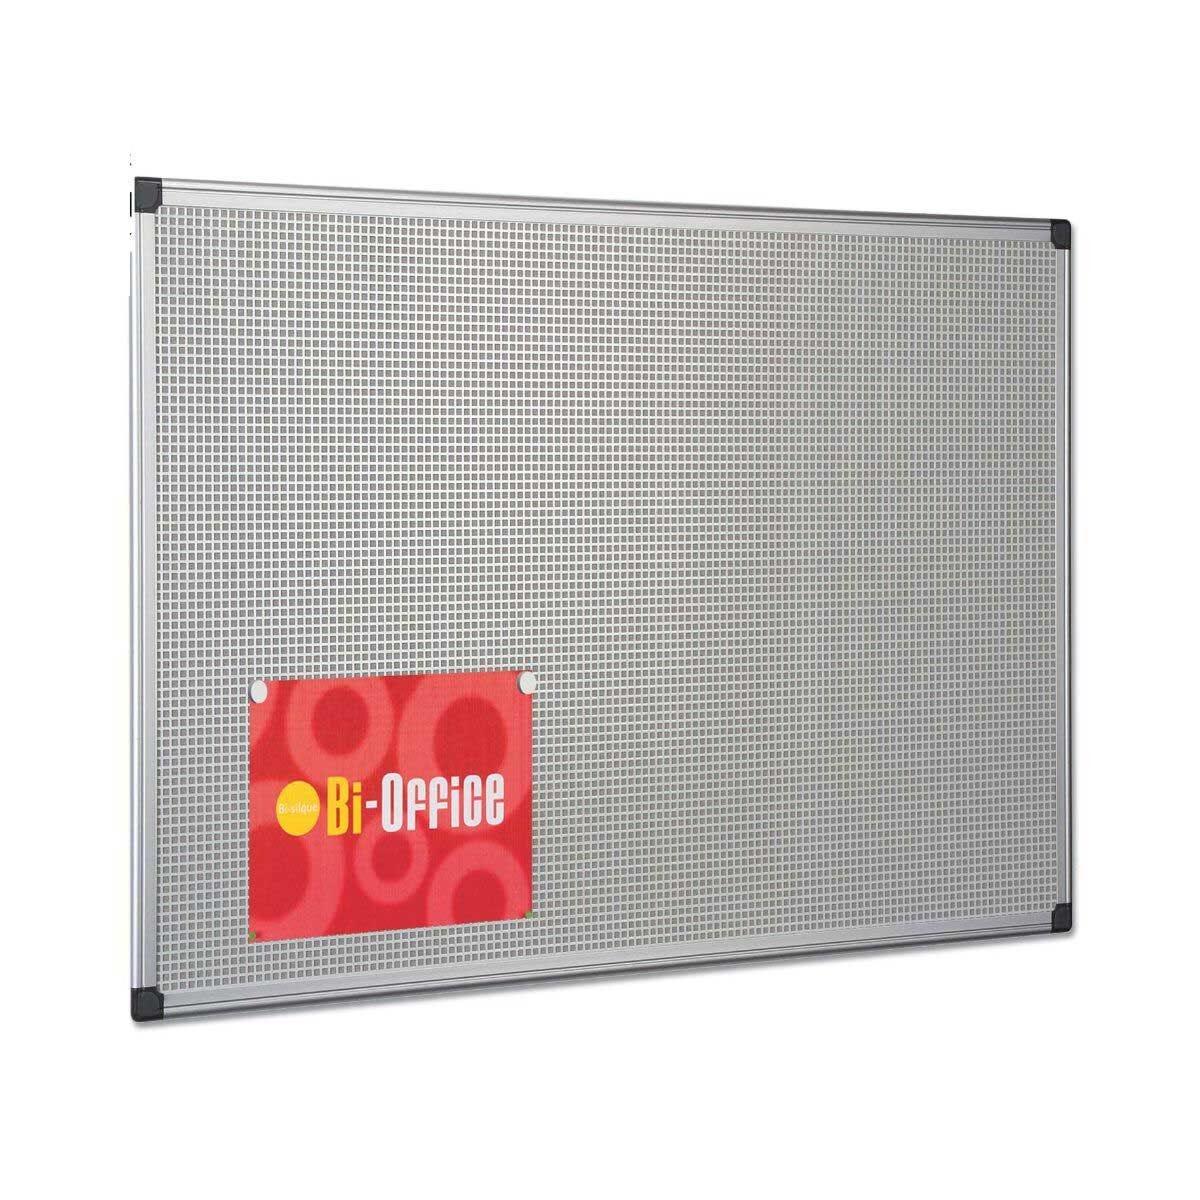 Bi-Office Combonet Notice Board 600x900mm